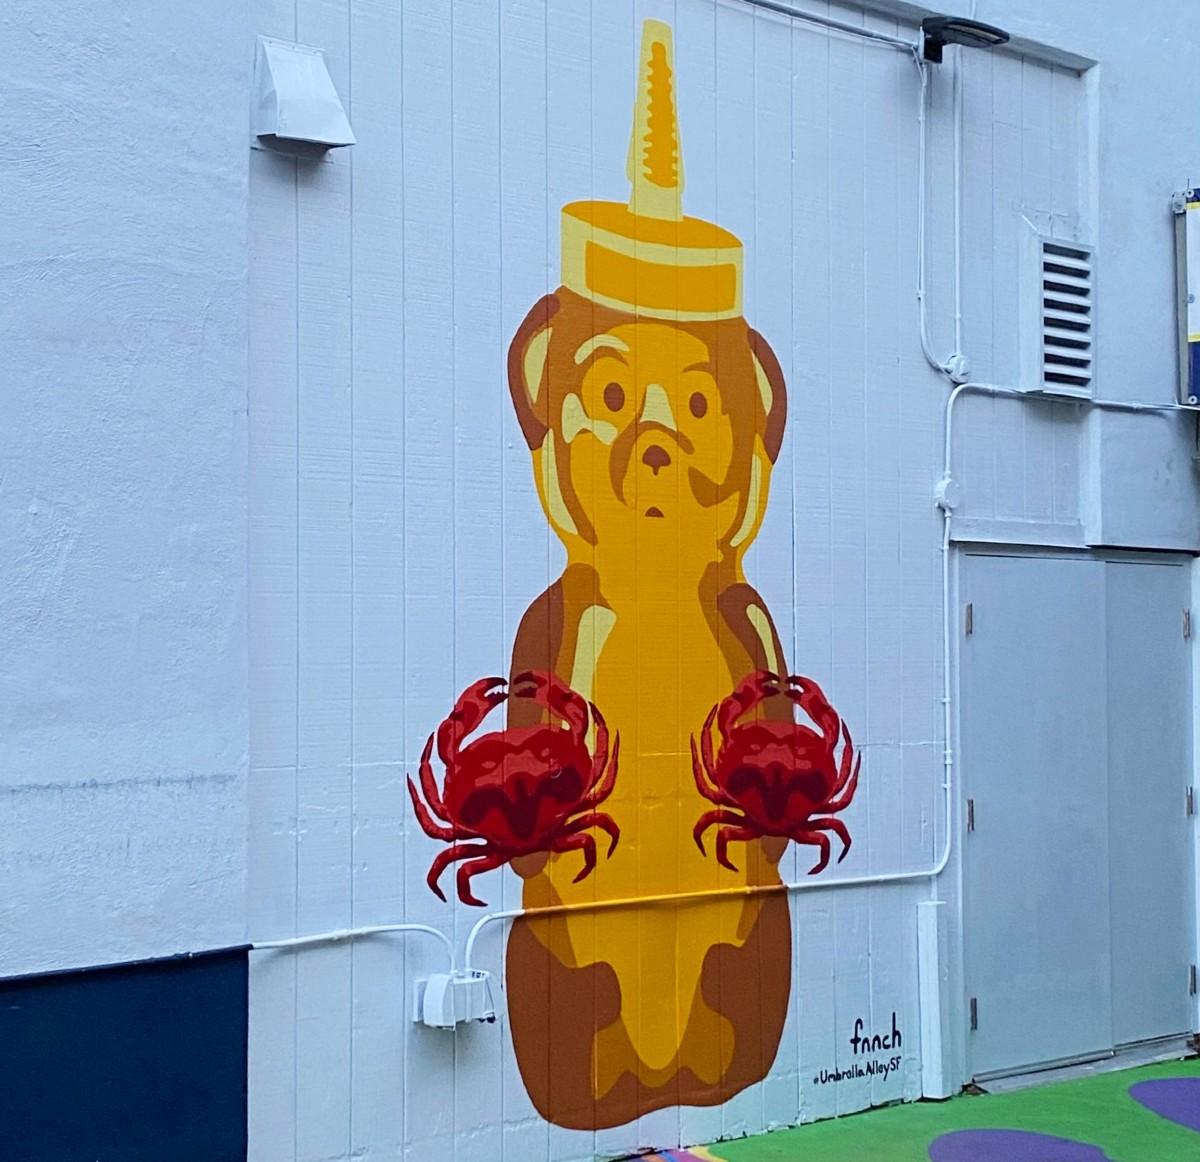 Fnnch Fisherman's Wharf Honey Bear Mural